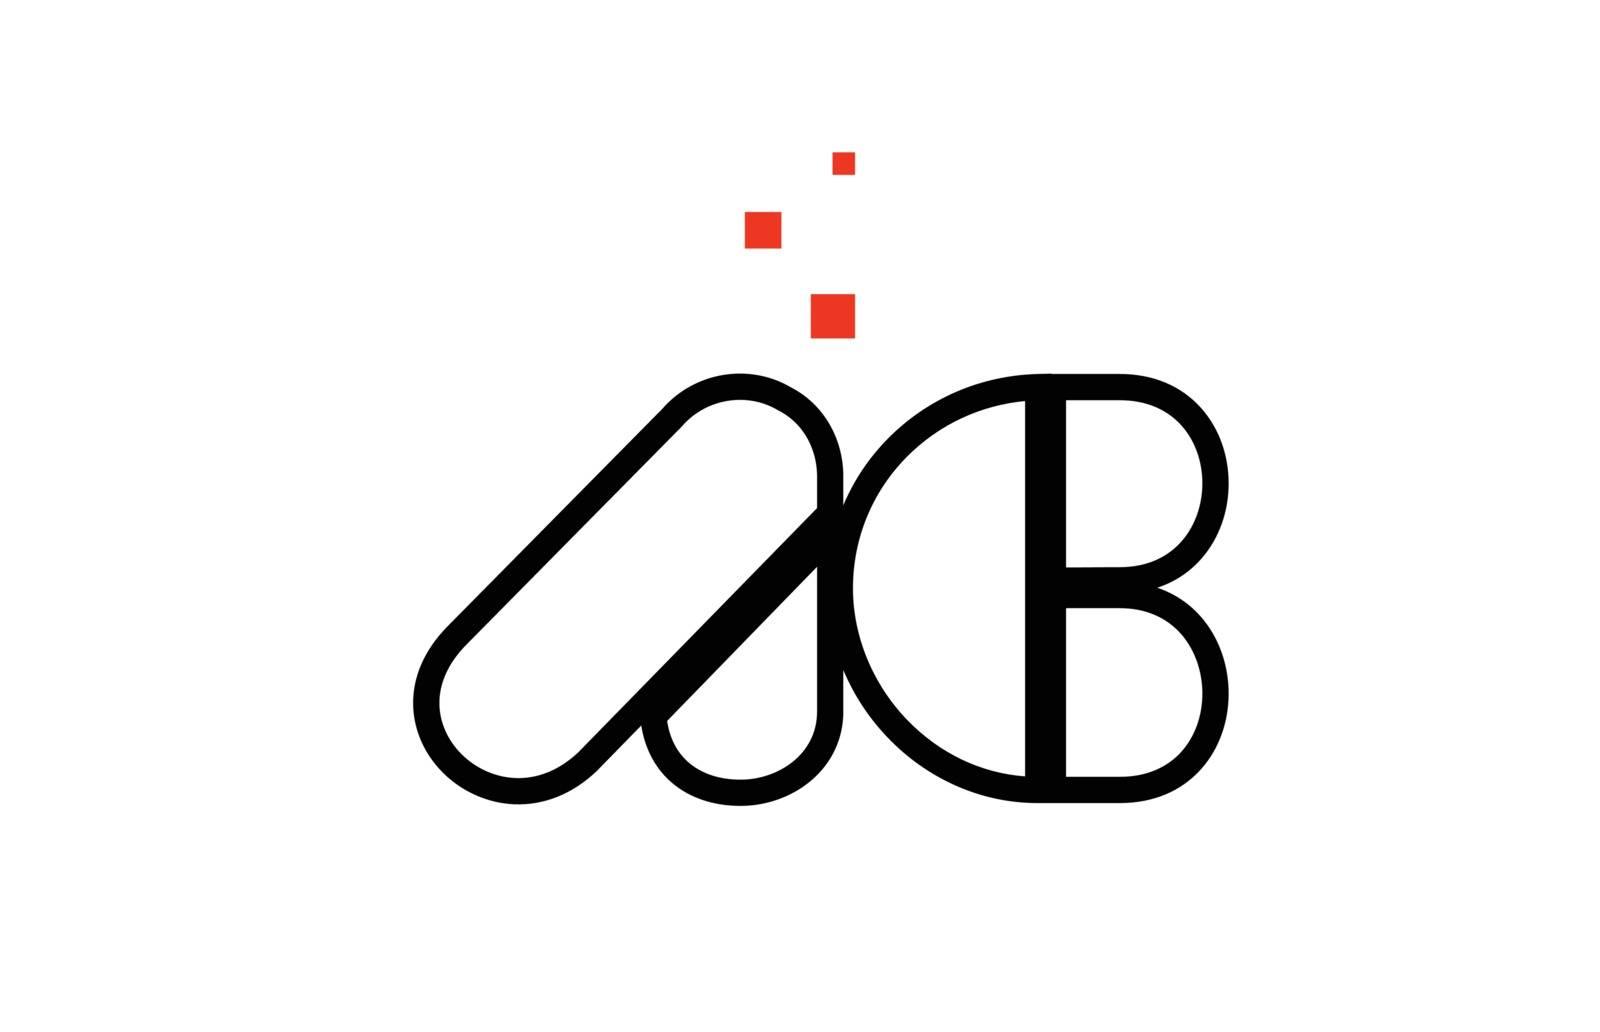 AC A C black white red alphabet letter combination logo icon des by dragomirescu